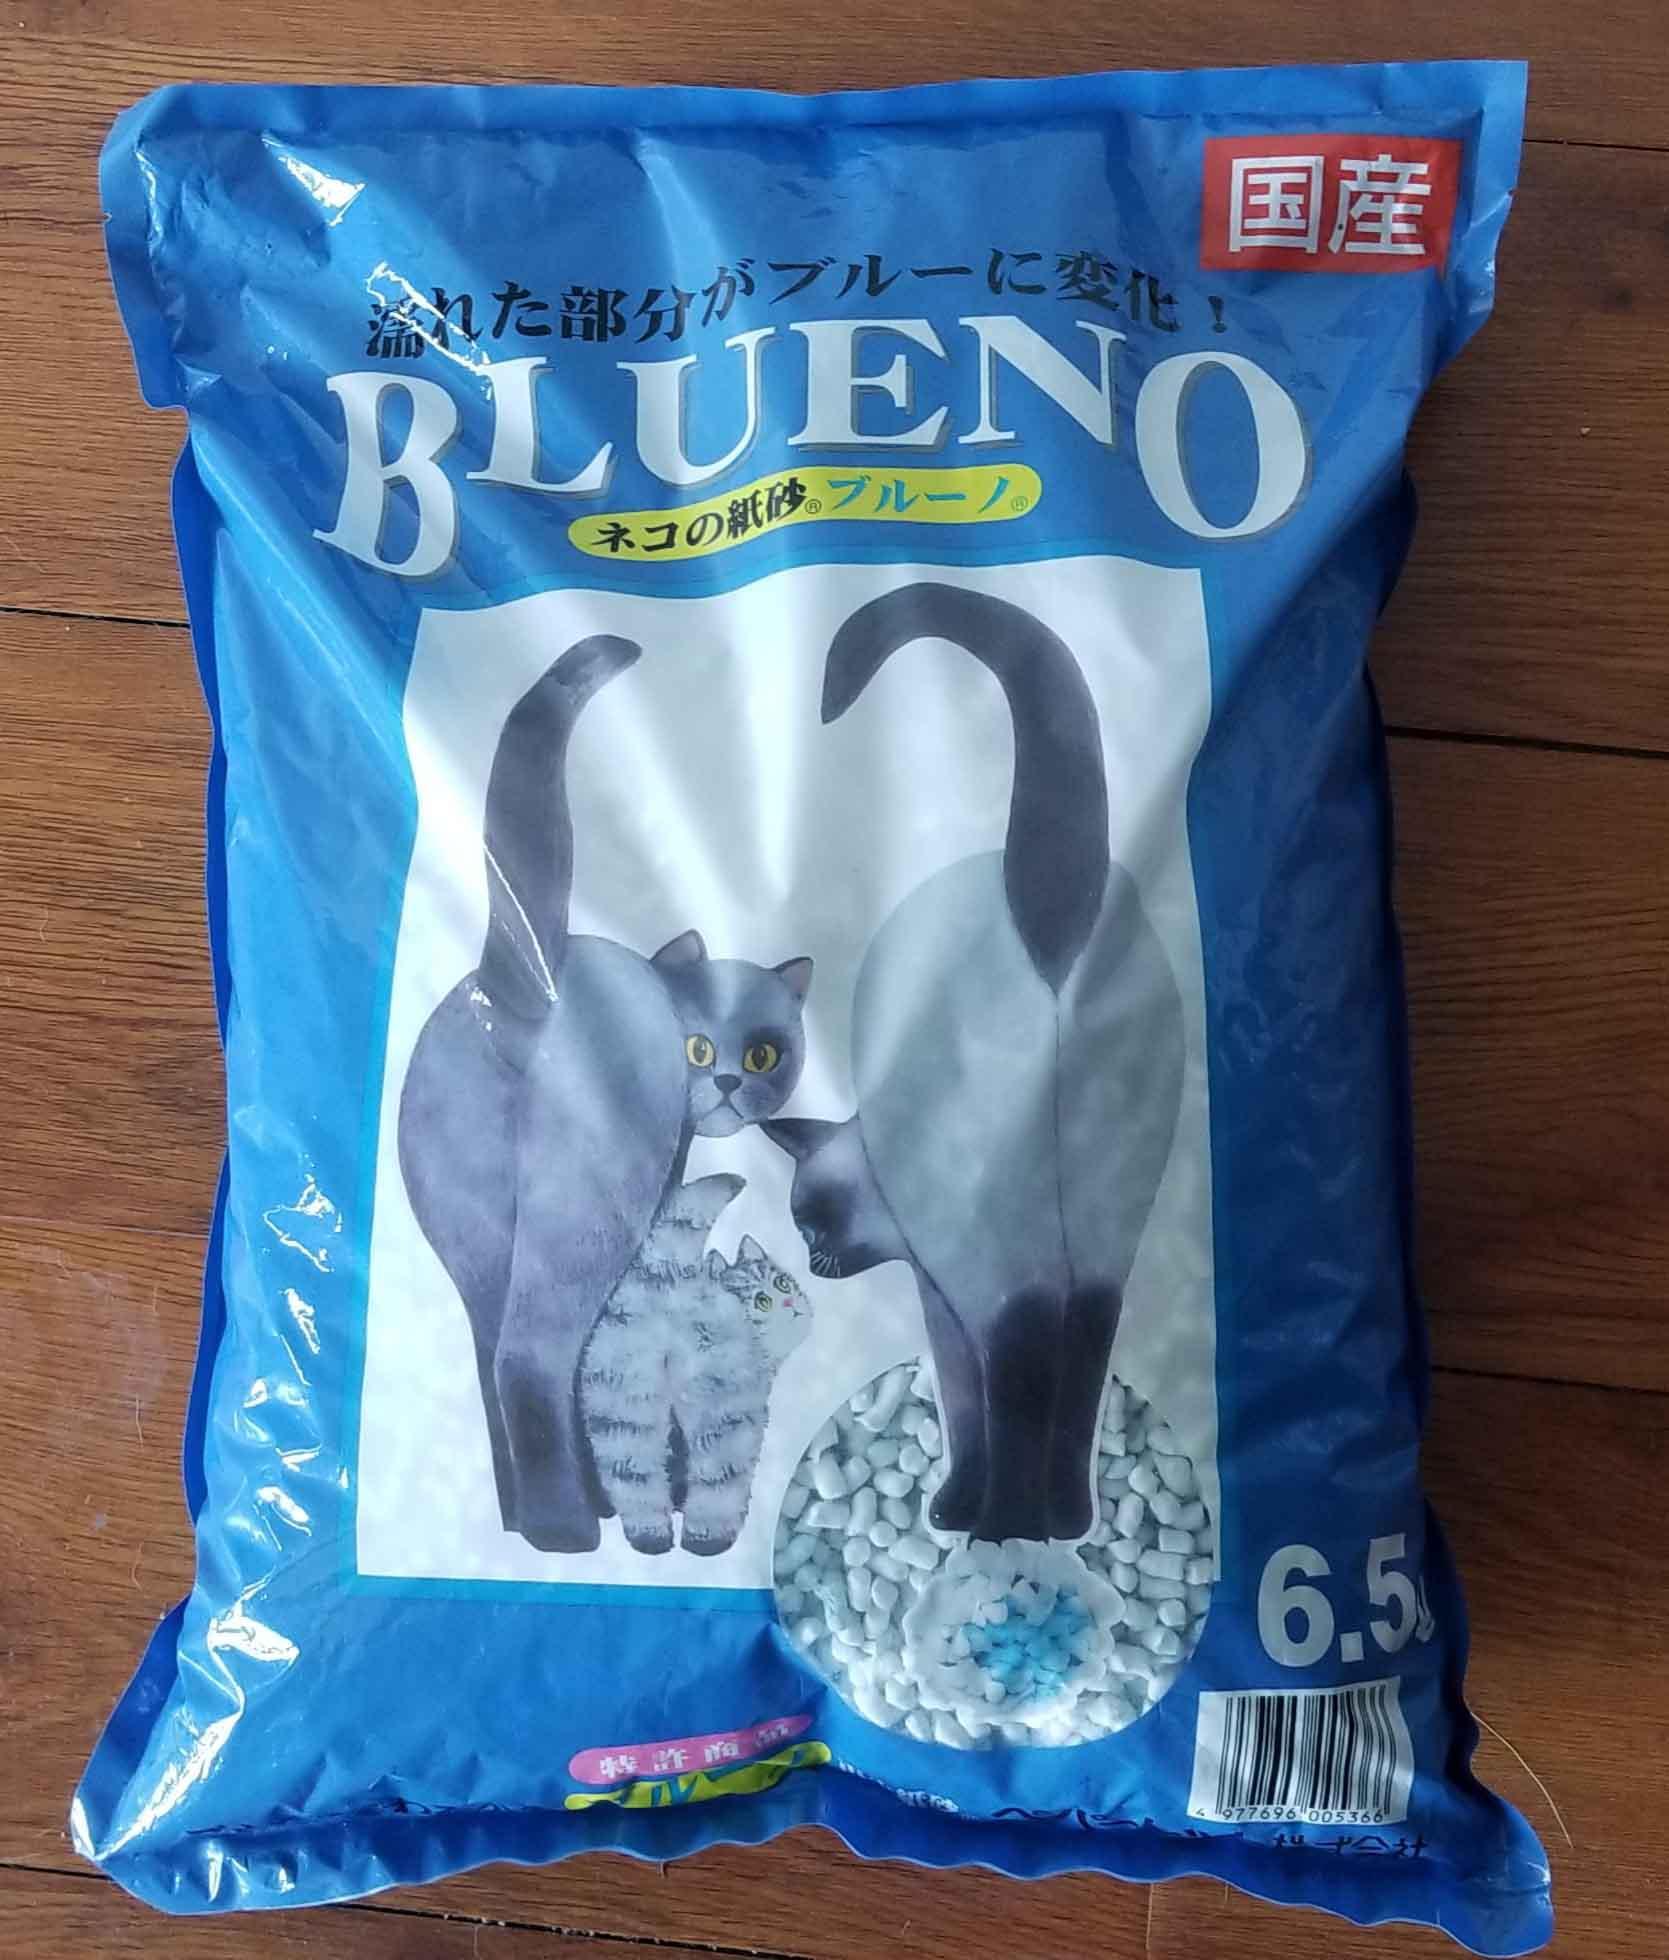 BLUENO 6.5L變藍色紙砂